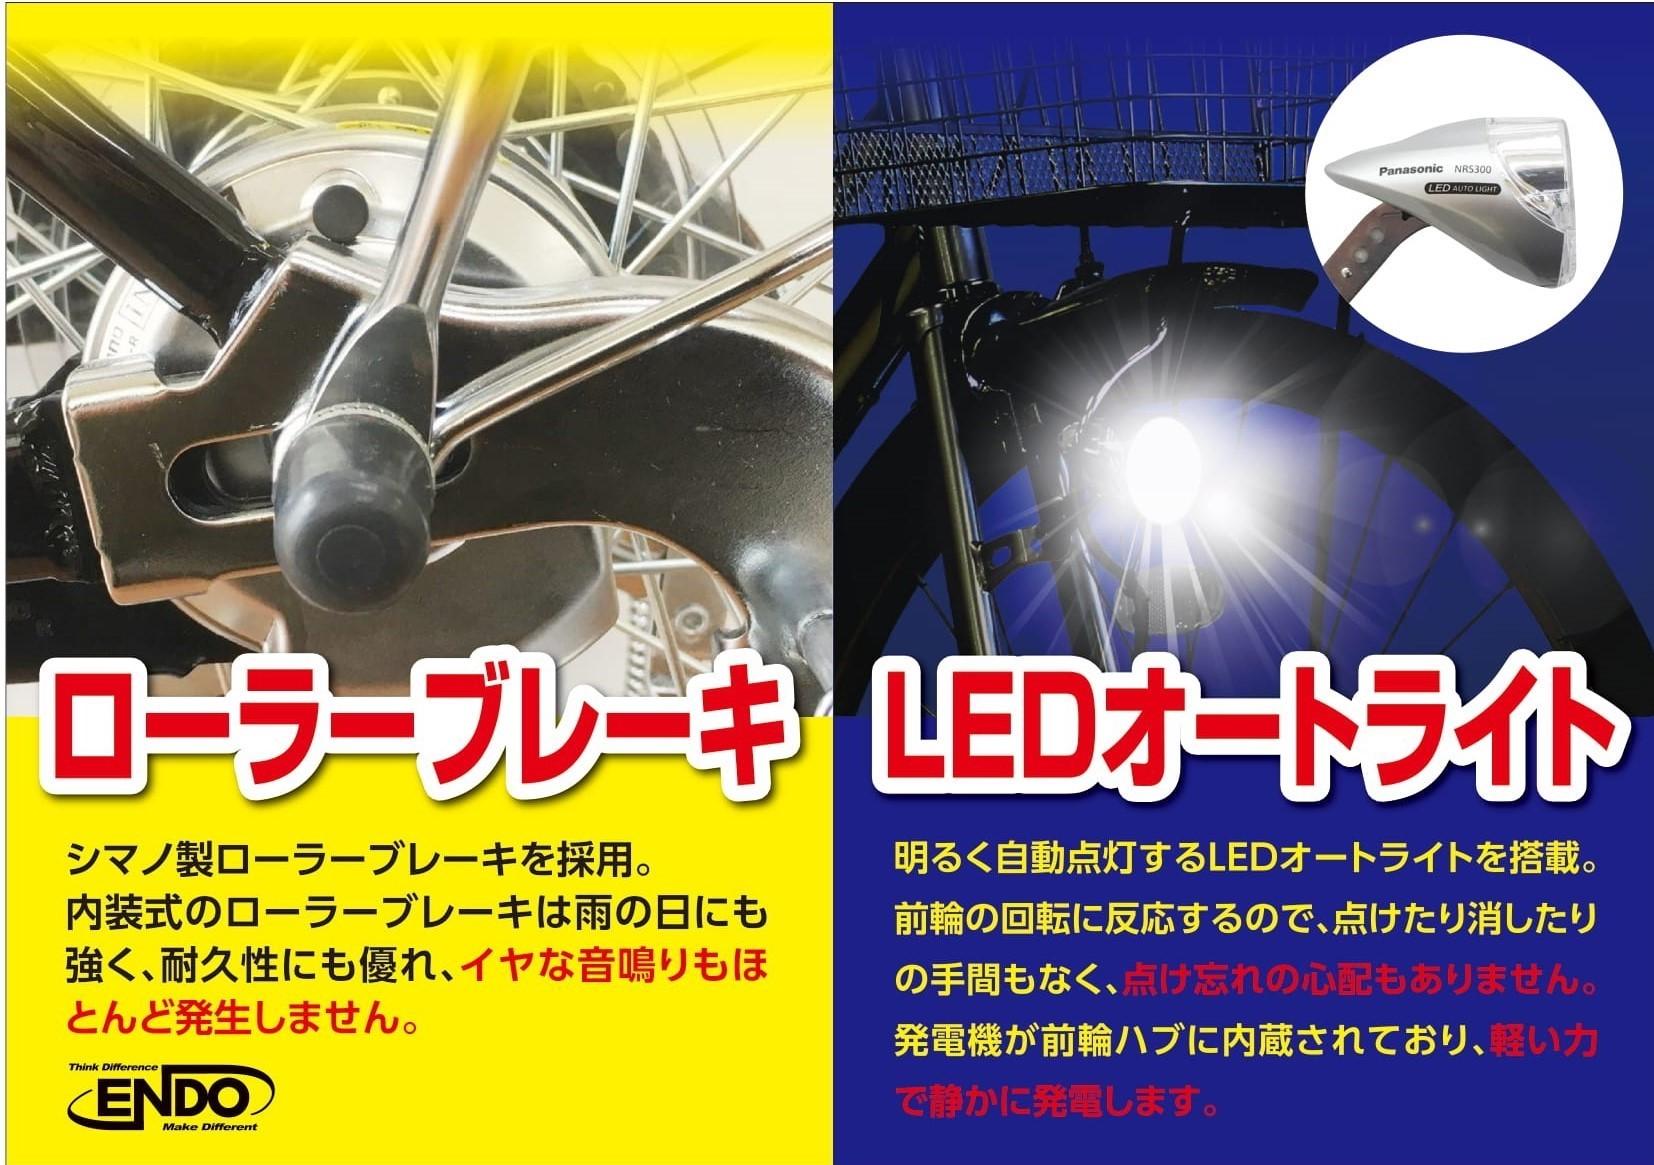 LEDオート・ローラー販促POP